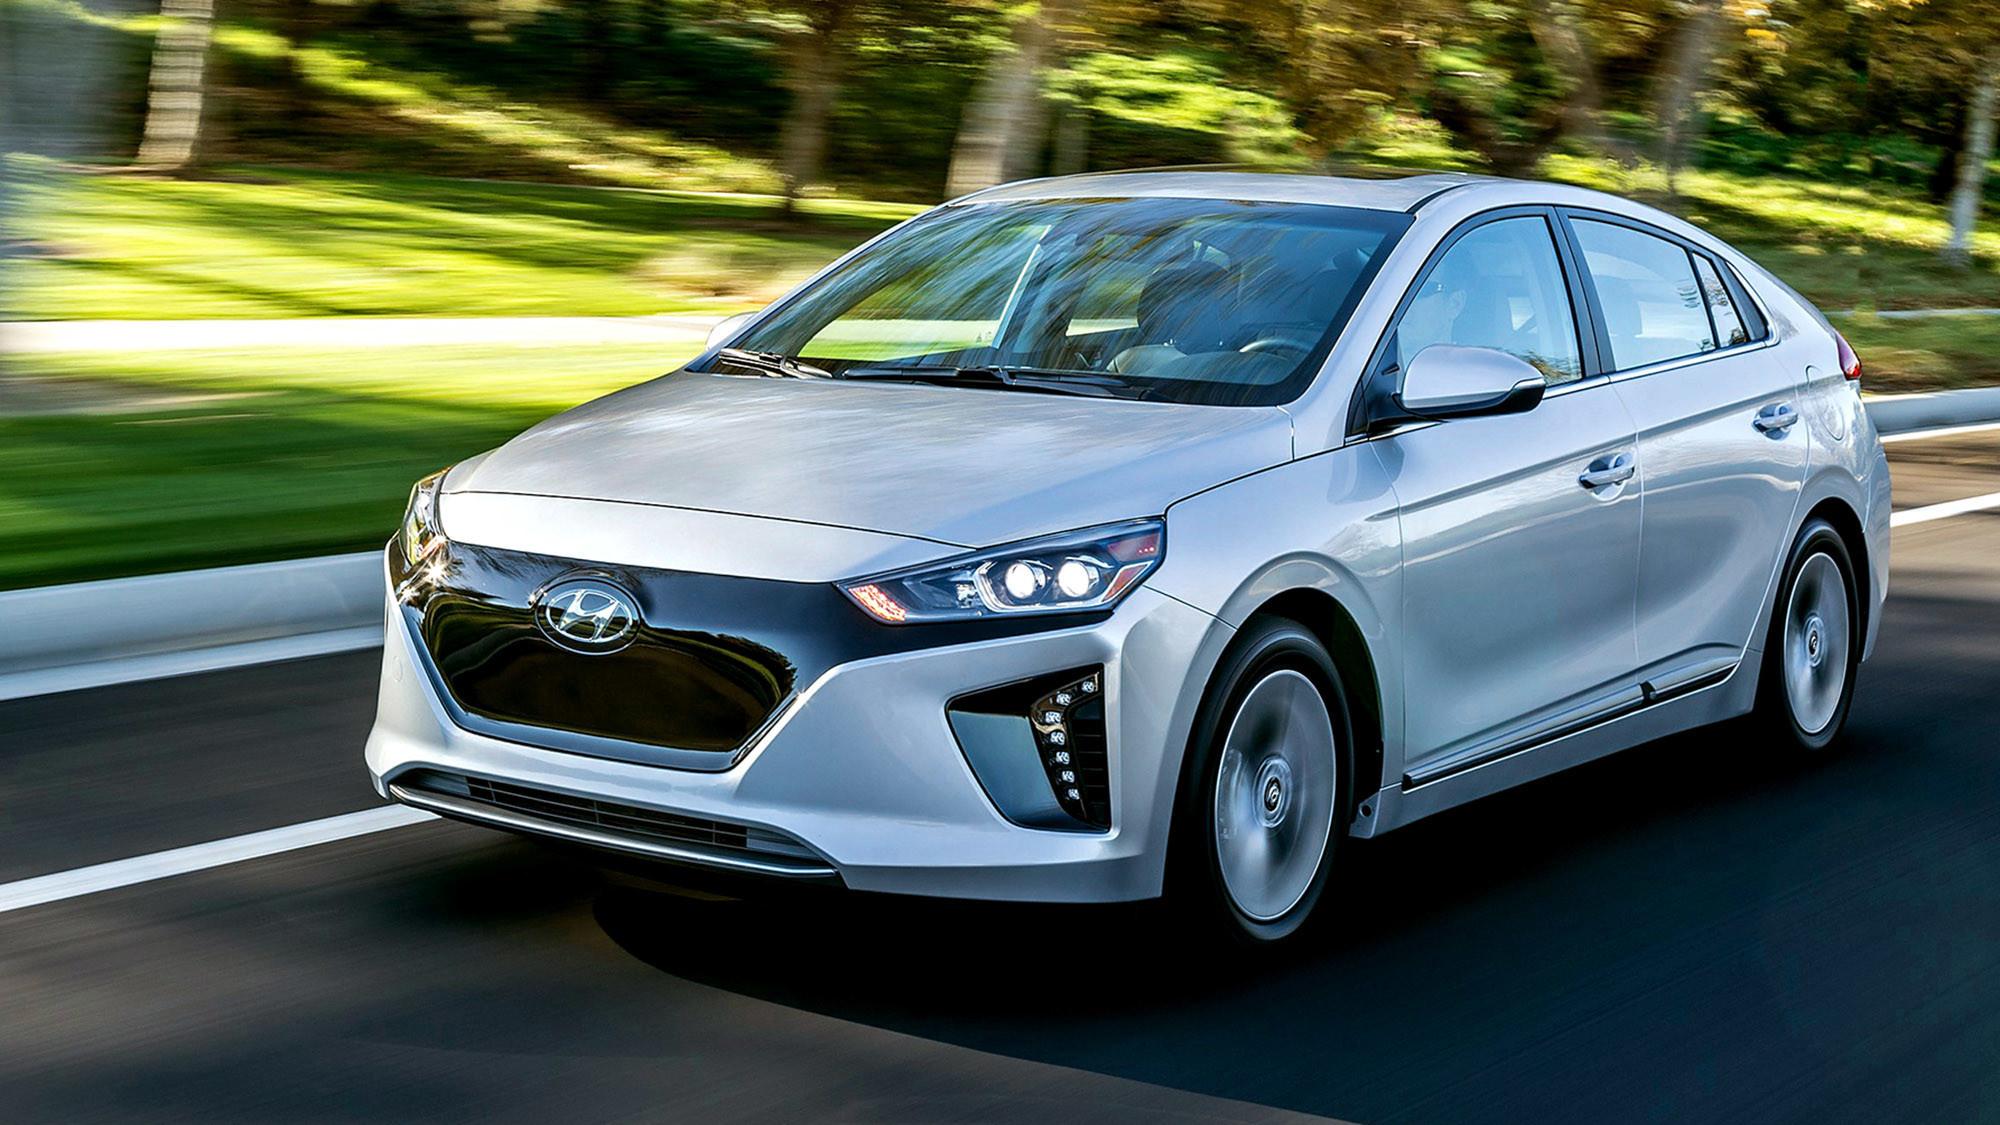 Free juice! Hyundai reimburses electric charging costs to Ioniq drivers - LA Times